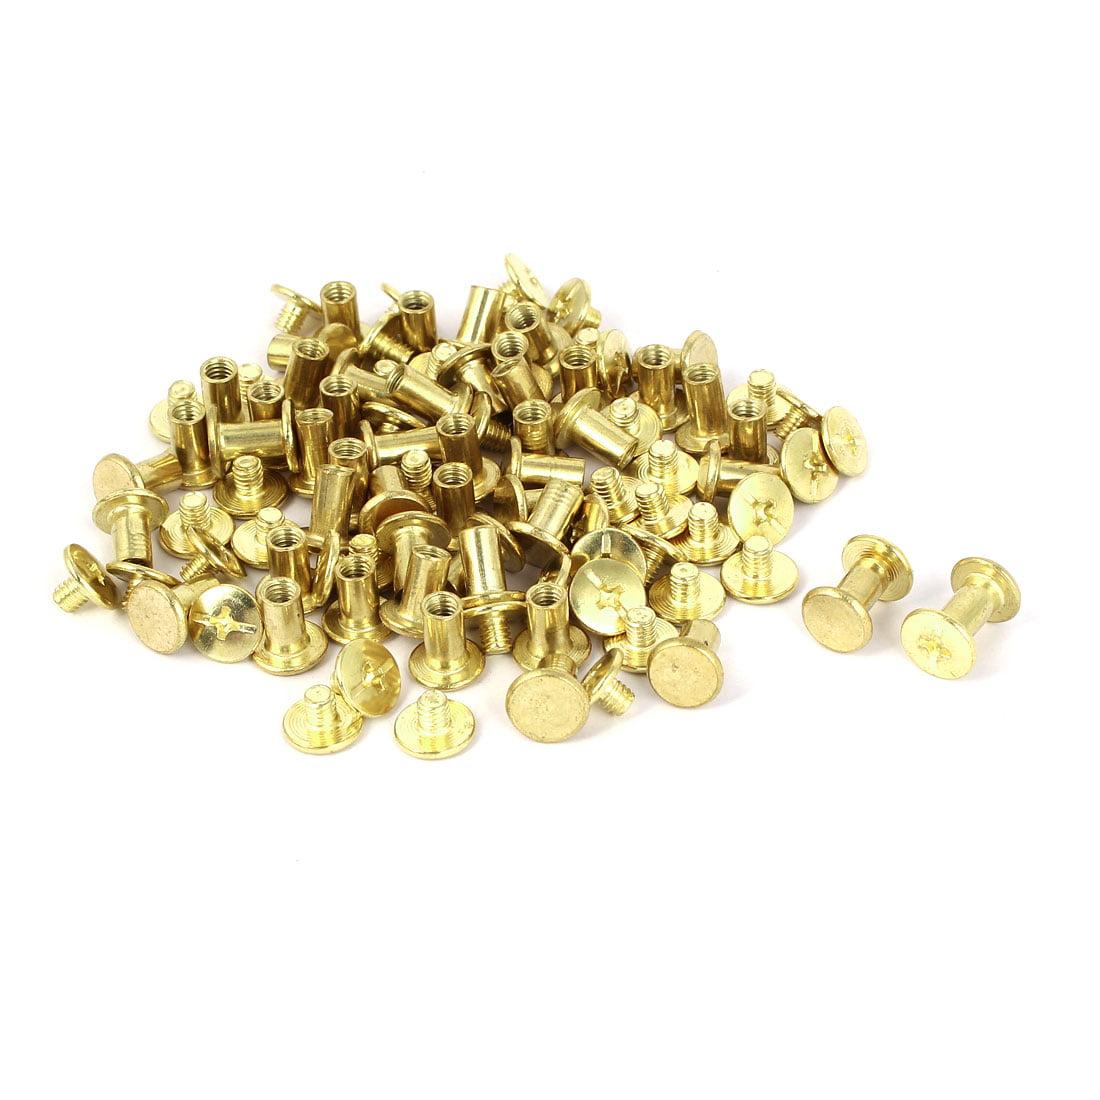 Uxcell Brass Plated Chicago Screws Binding Posts Docking Rivet 5mmx8mm (50-pack)